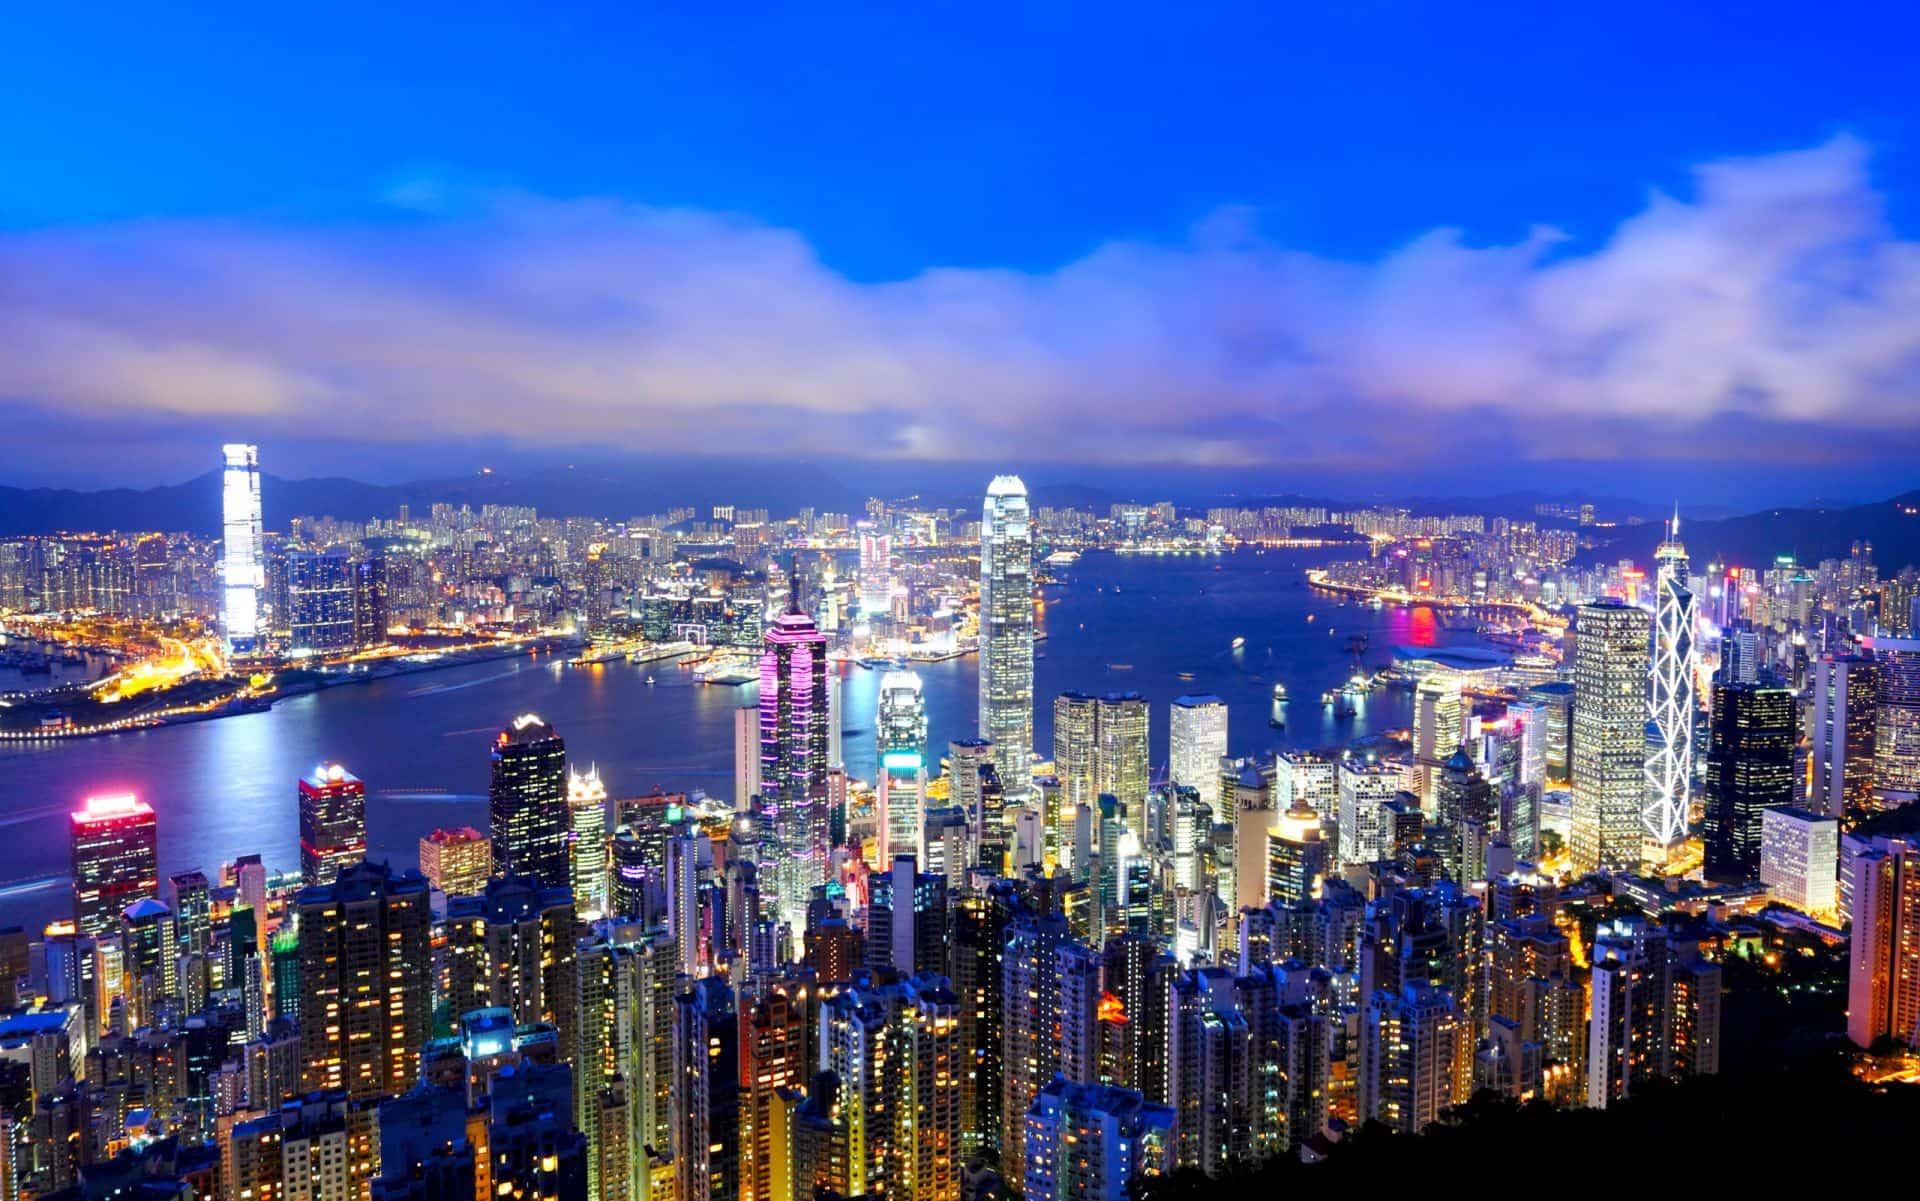 Hong Kong Skyline At Night From Victoria Peak